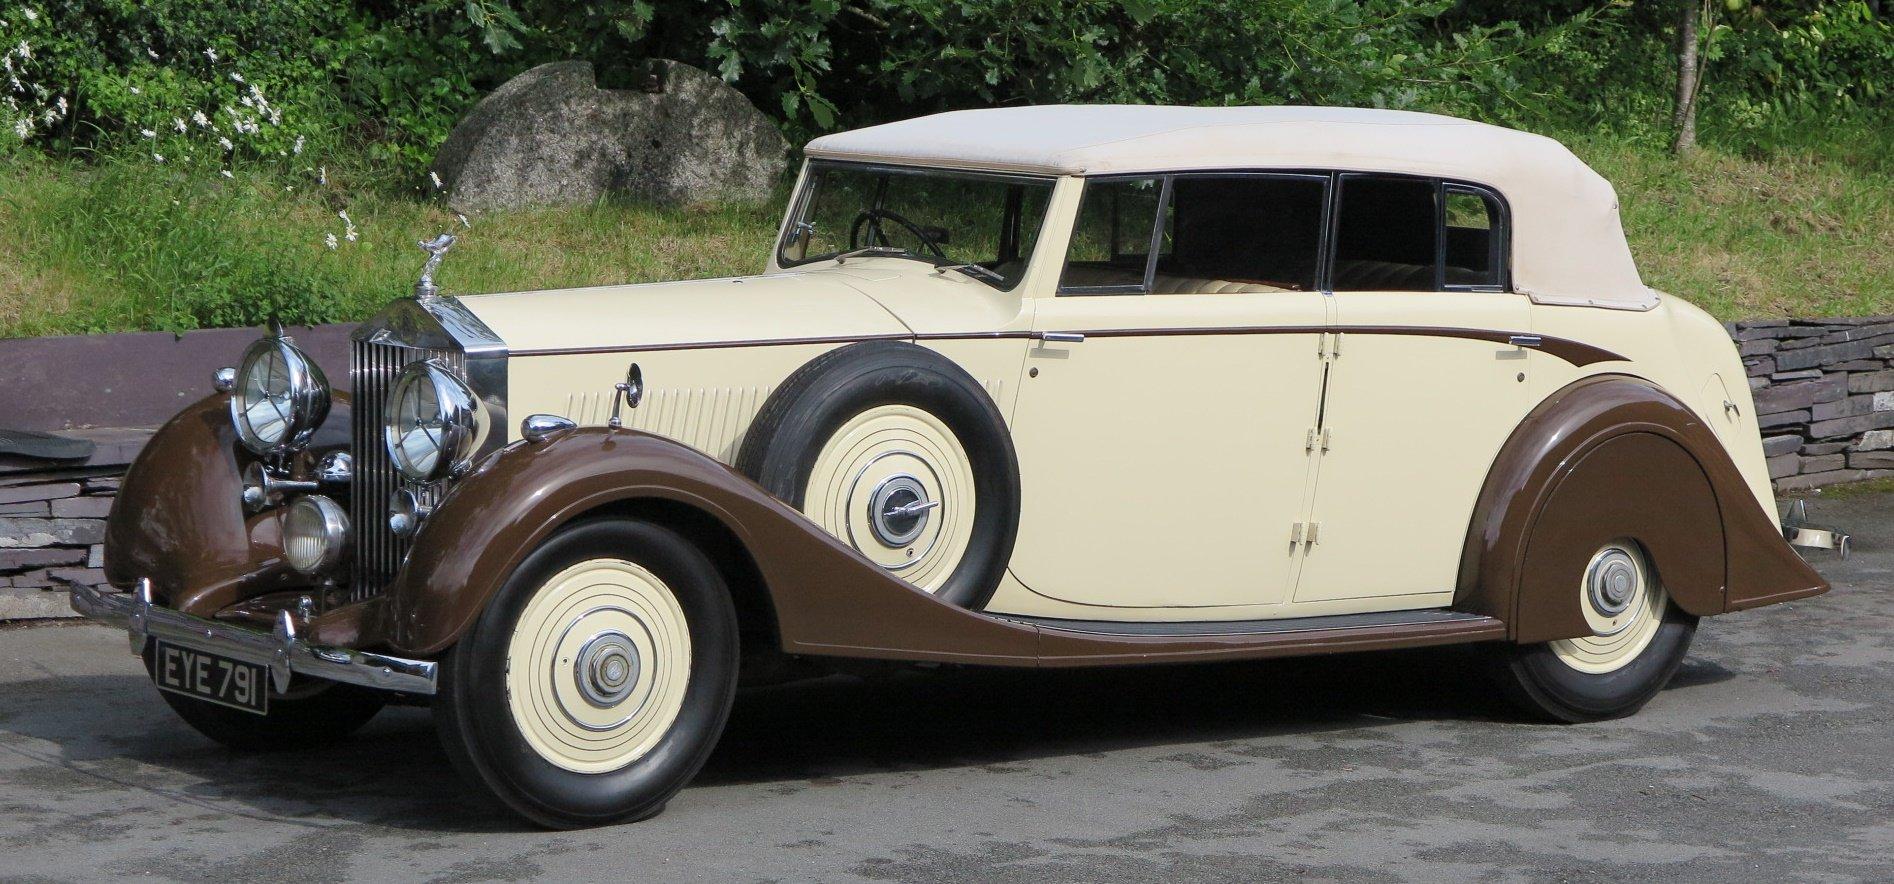 1938 Rolls-Royce 25/30 Park Ward 4 Dr  Cabriolet GGR54 For Sale (picture 3 of 6)